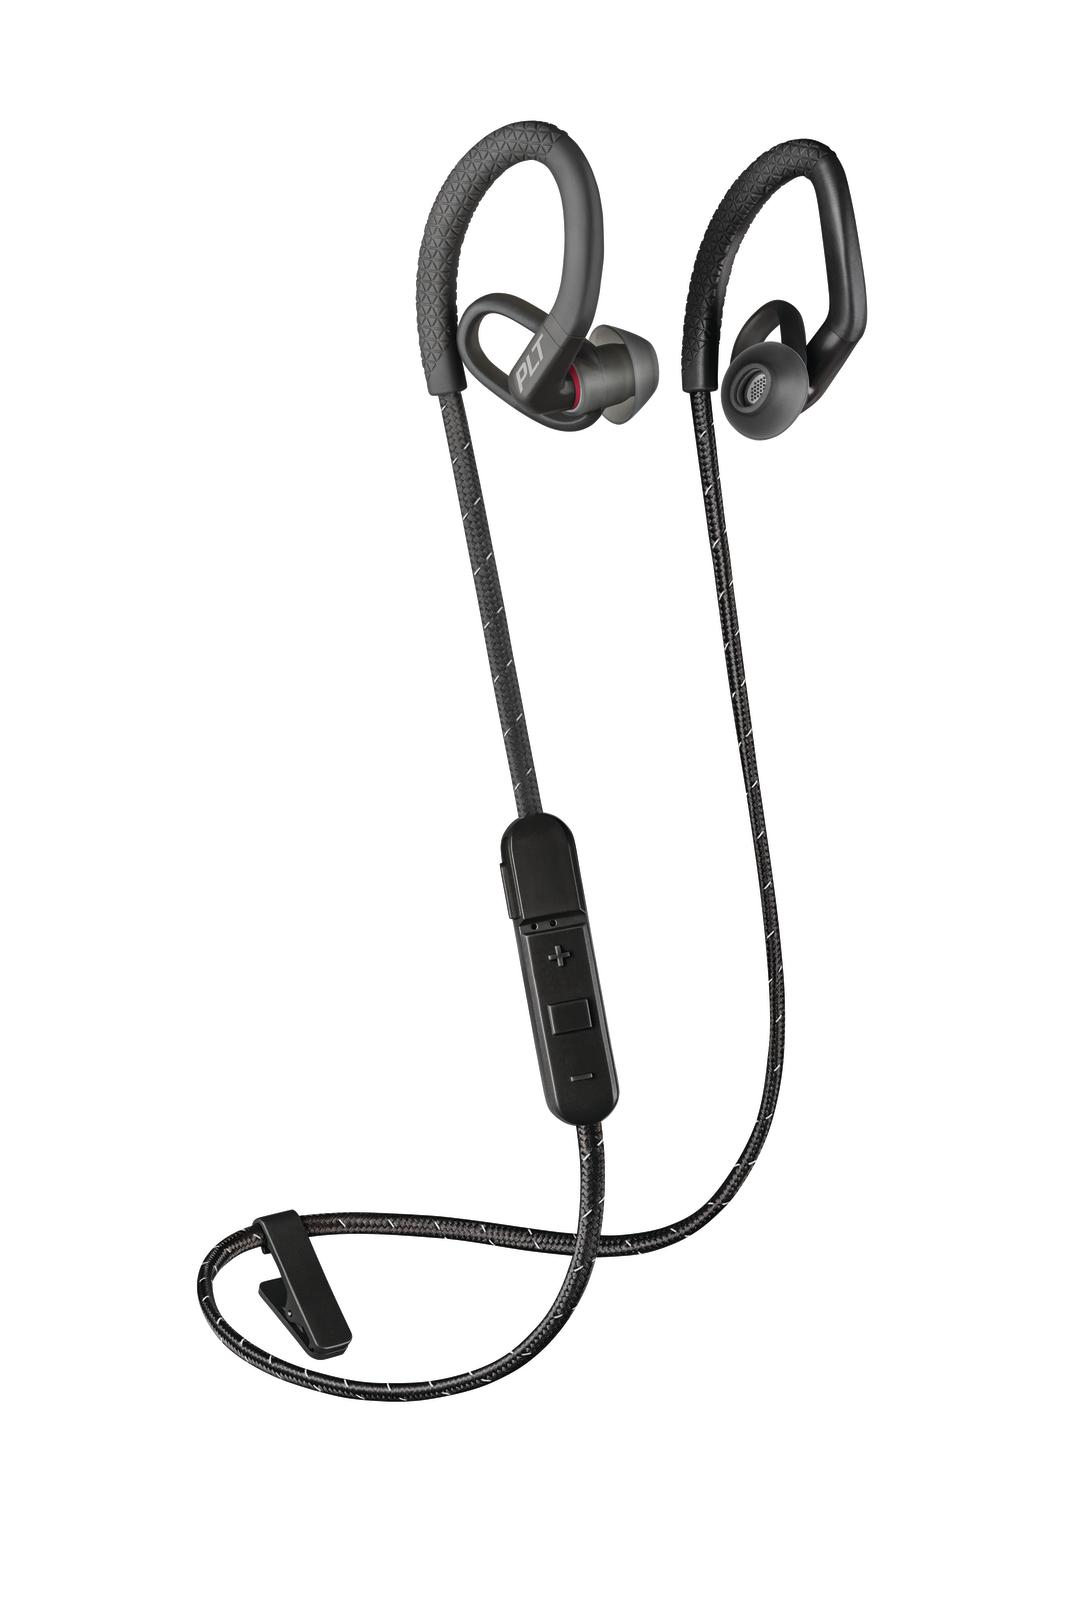 Plantronics: BackBeat Fit 350 Wireless Sports Earbuds - Black image